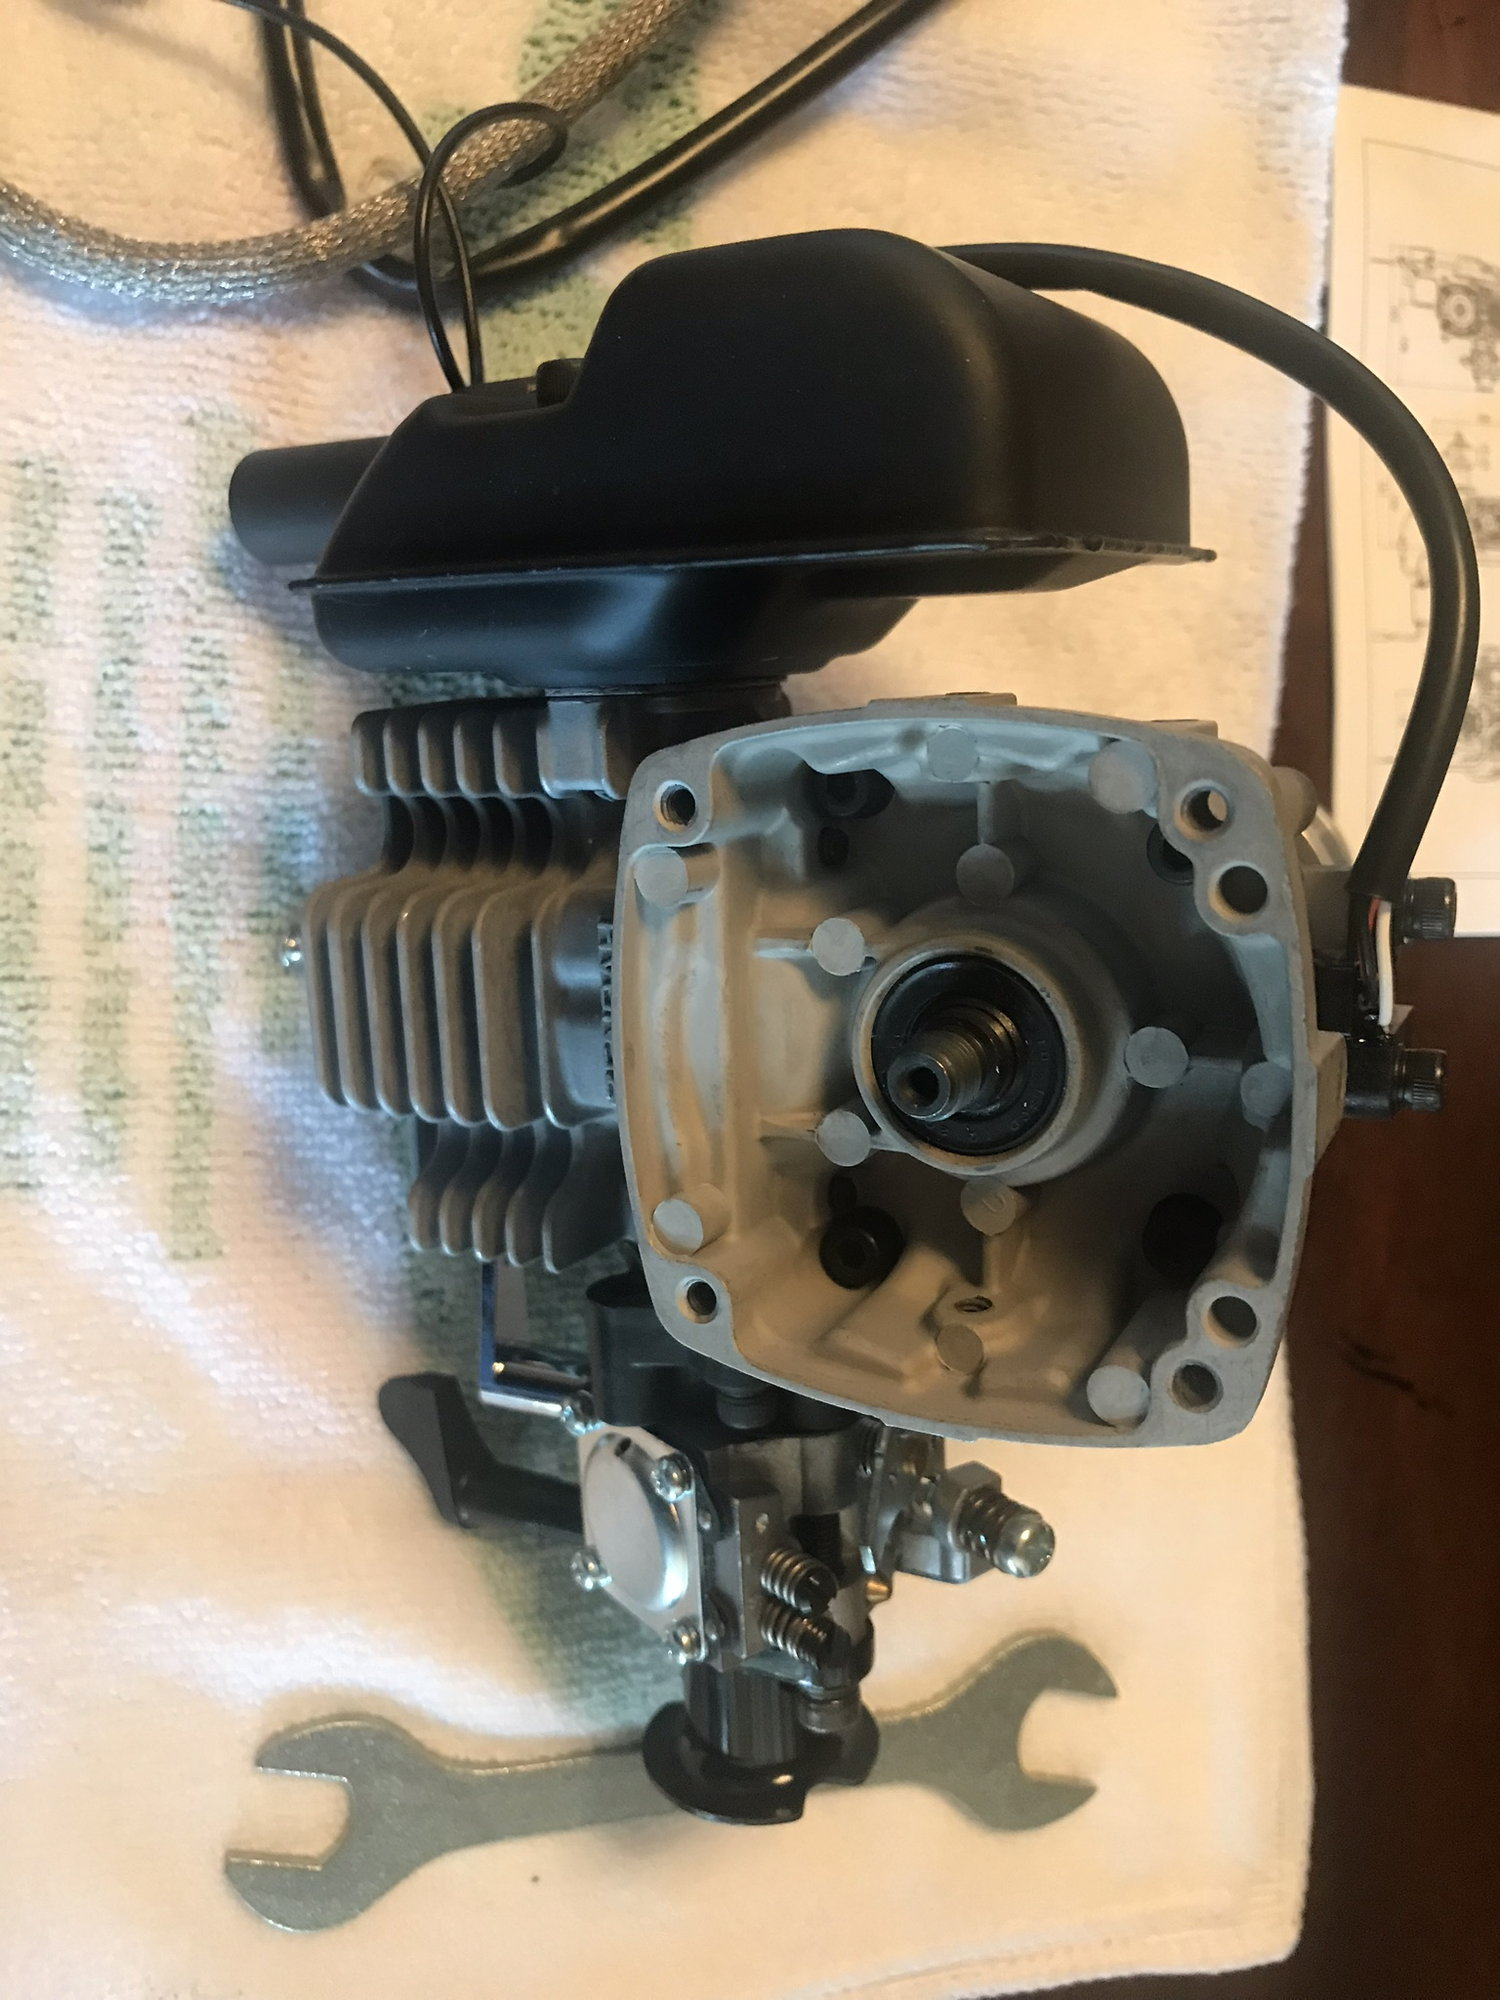 NEW Zenoah G200PU 20cc Electronic Ignition Gas Engine - RCU Forums